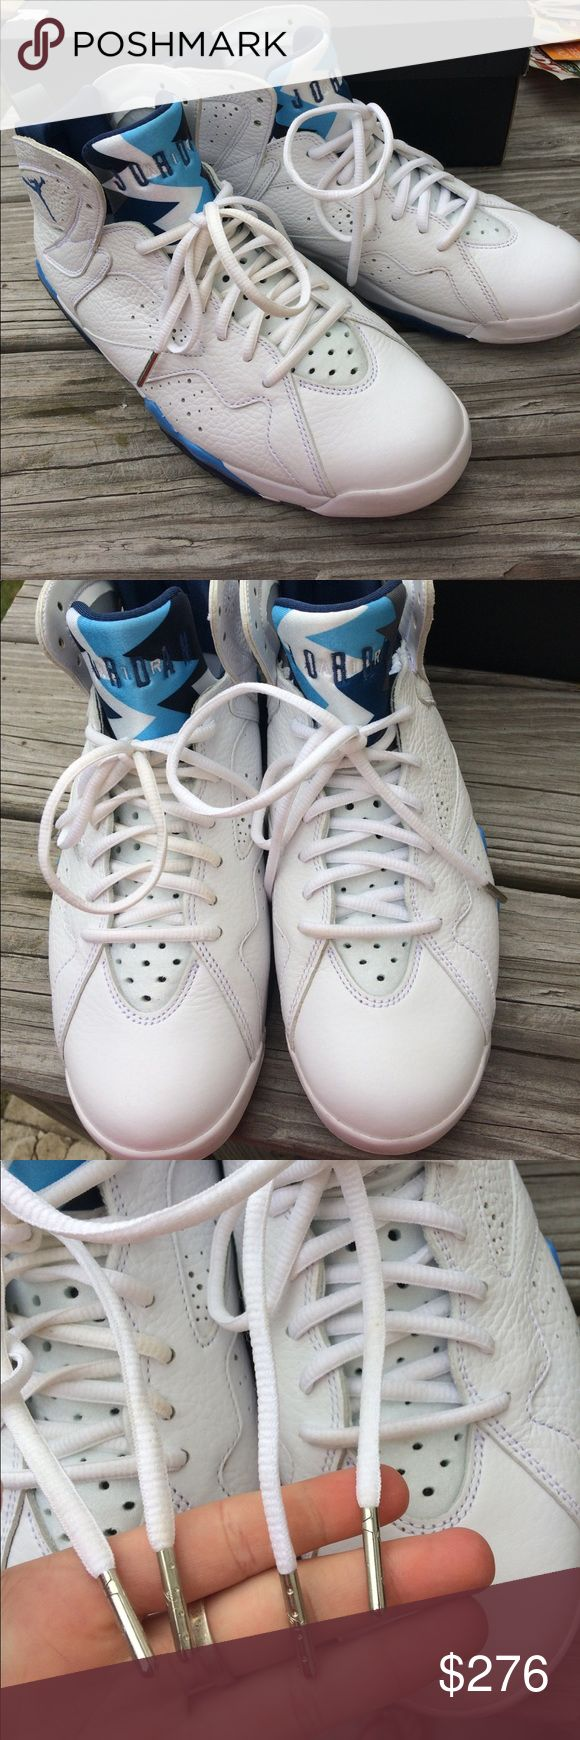 Air Jordan retro 7 Perfect condition and comes with og box and Jordan 23 paper Jordan Shoes Sneakers